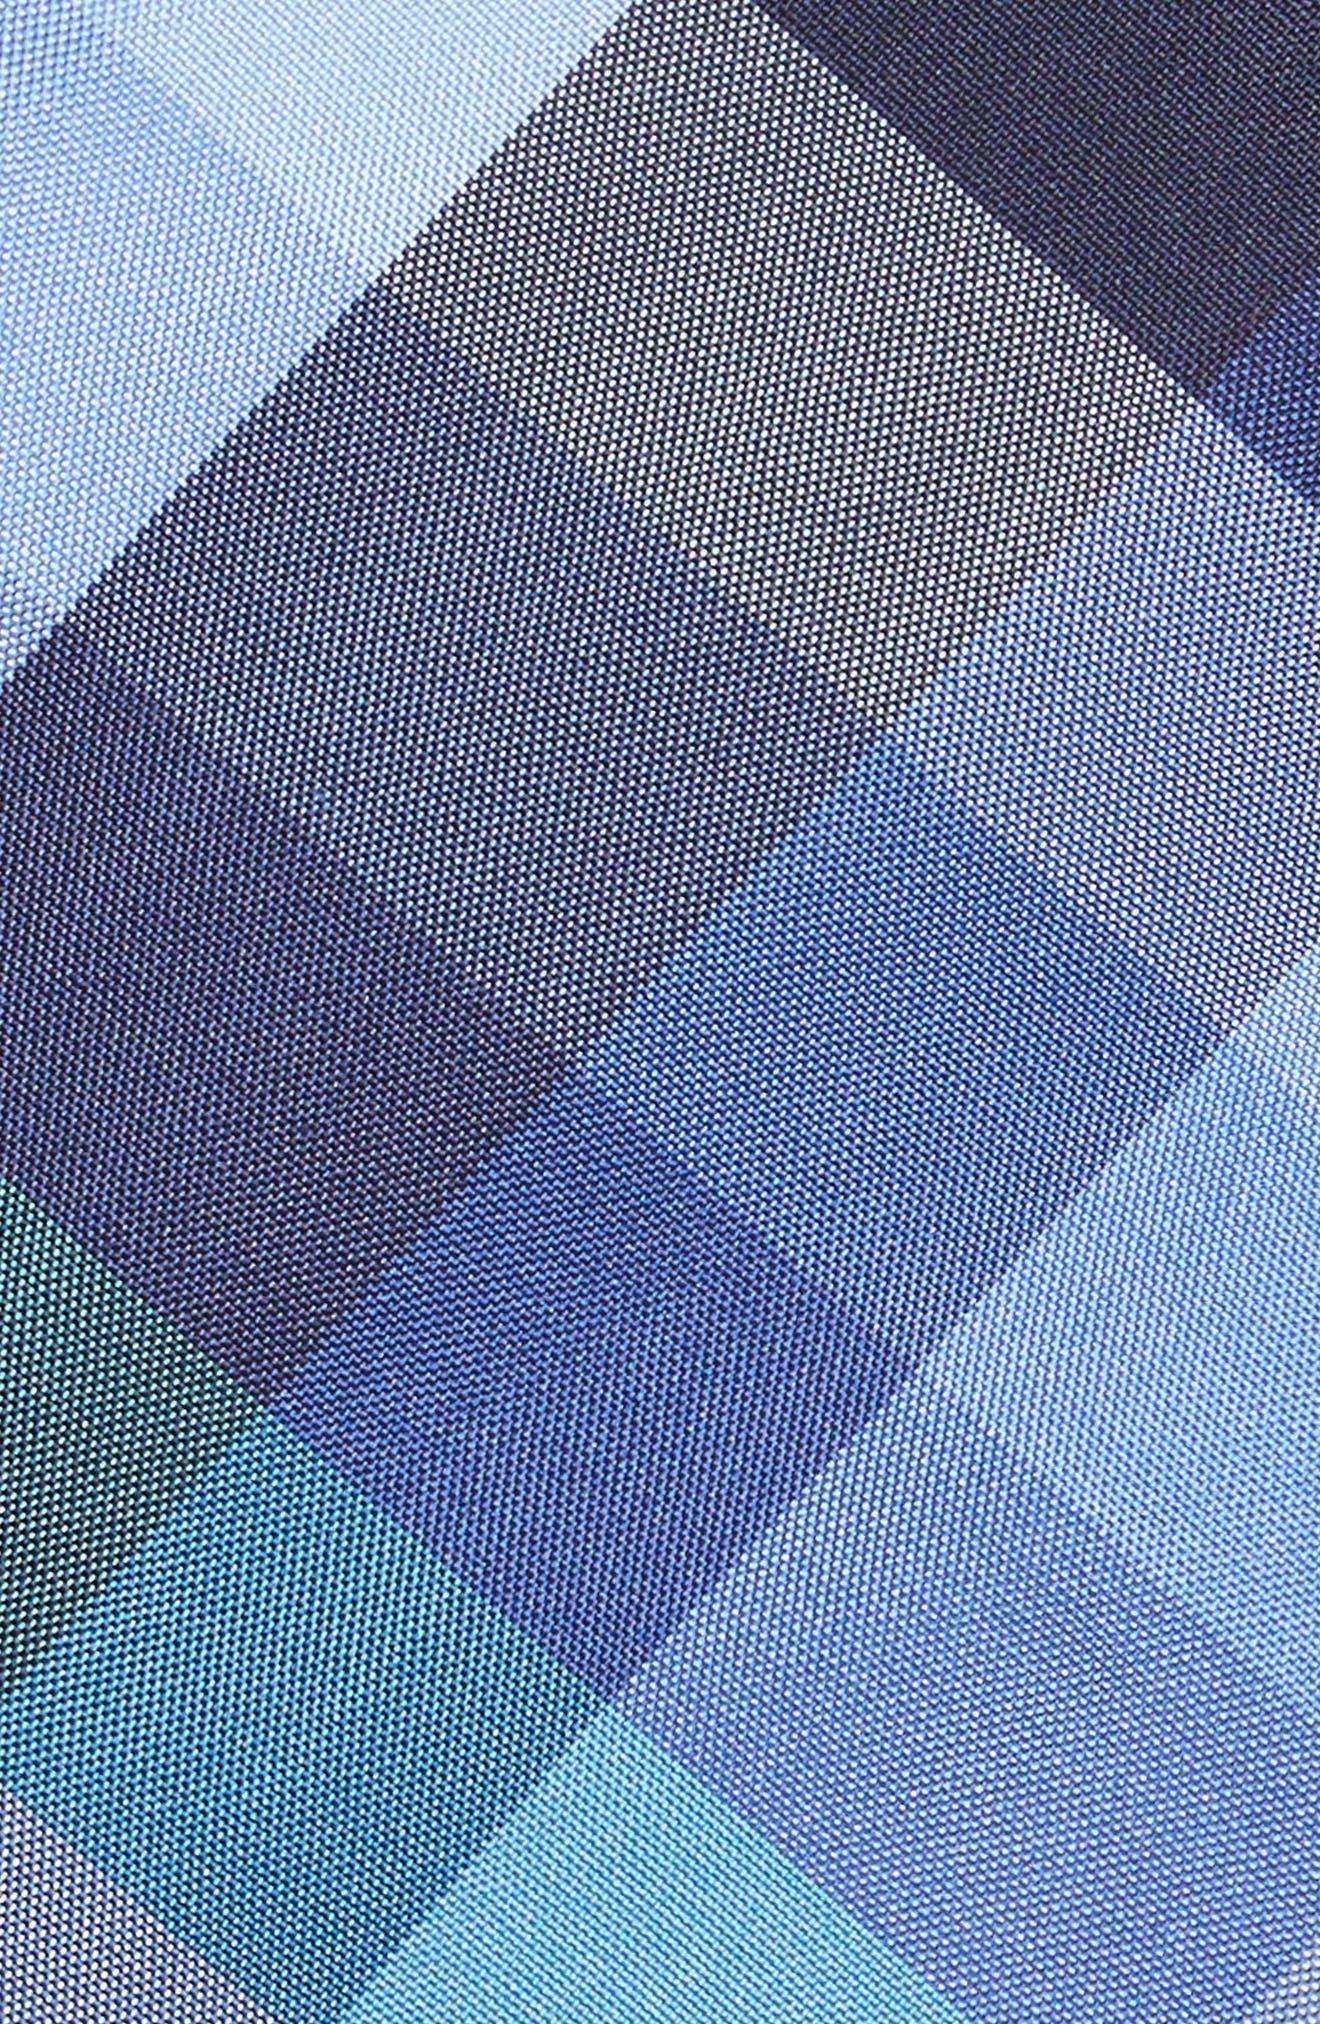 Alternate Image 2  - Nordstrom Men's Shop Autumn Check Silk Skinny Tie